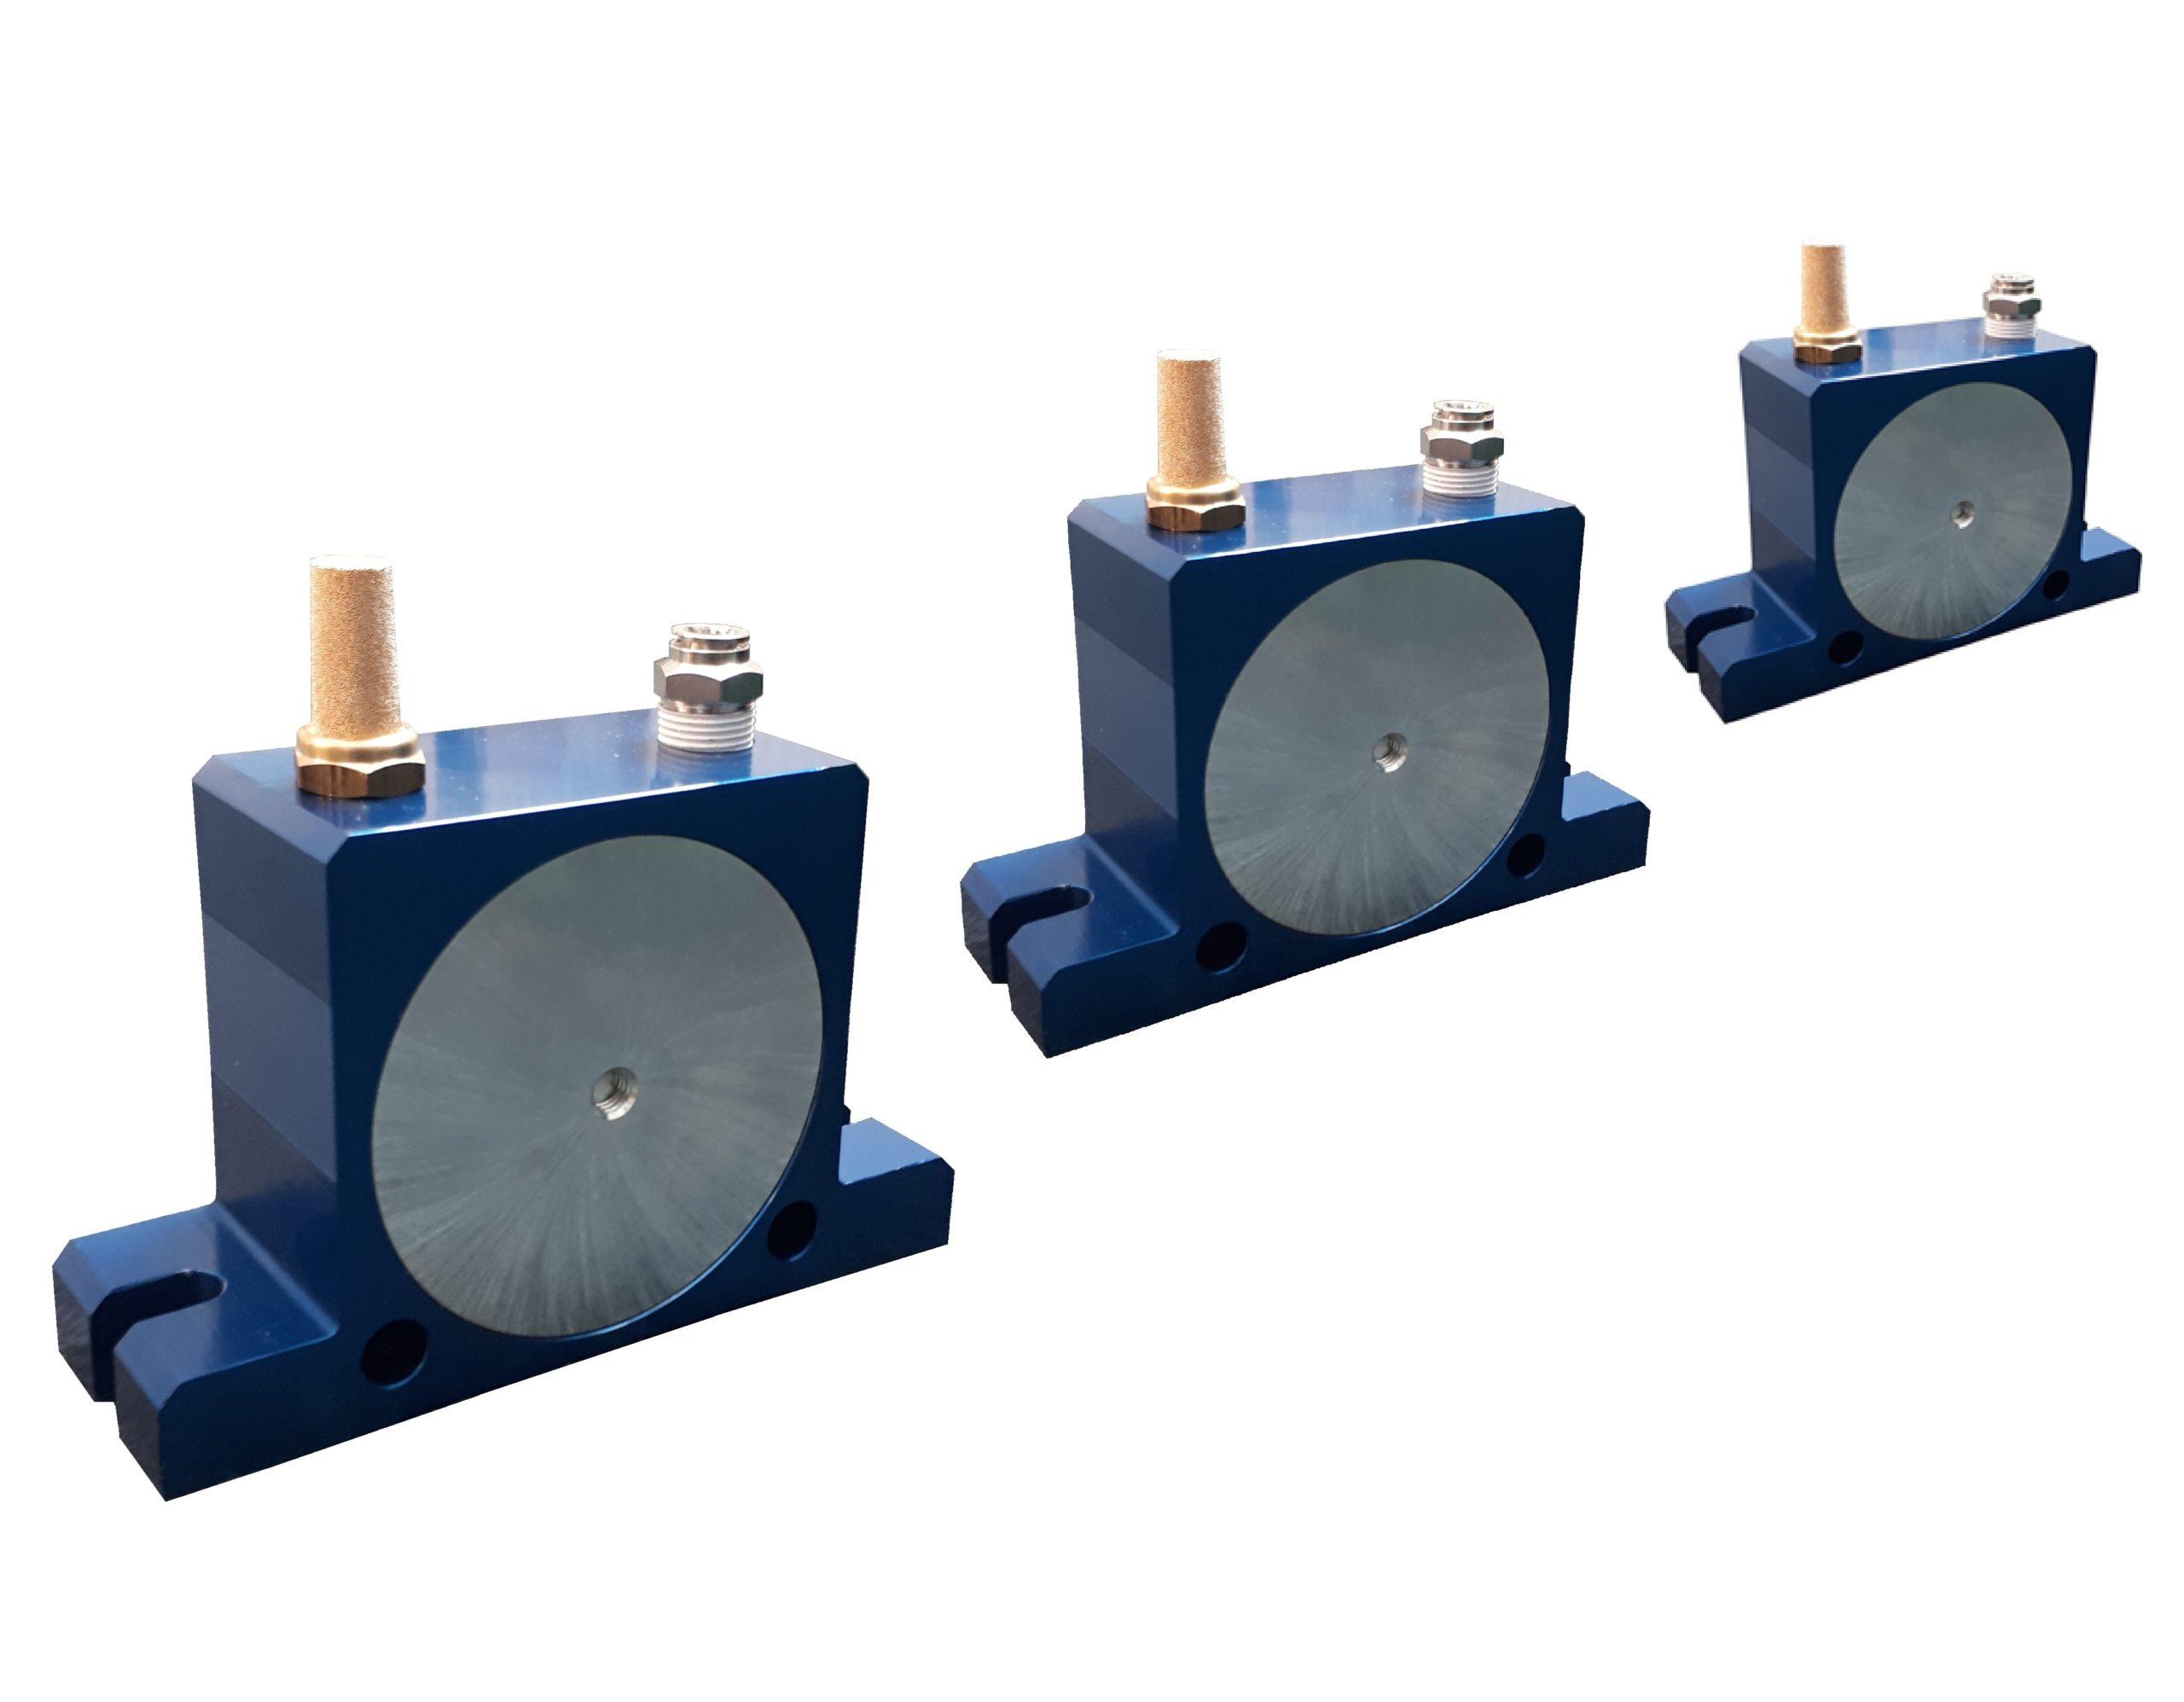 wibratory pneumatyczne kulowe serii S